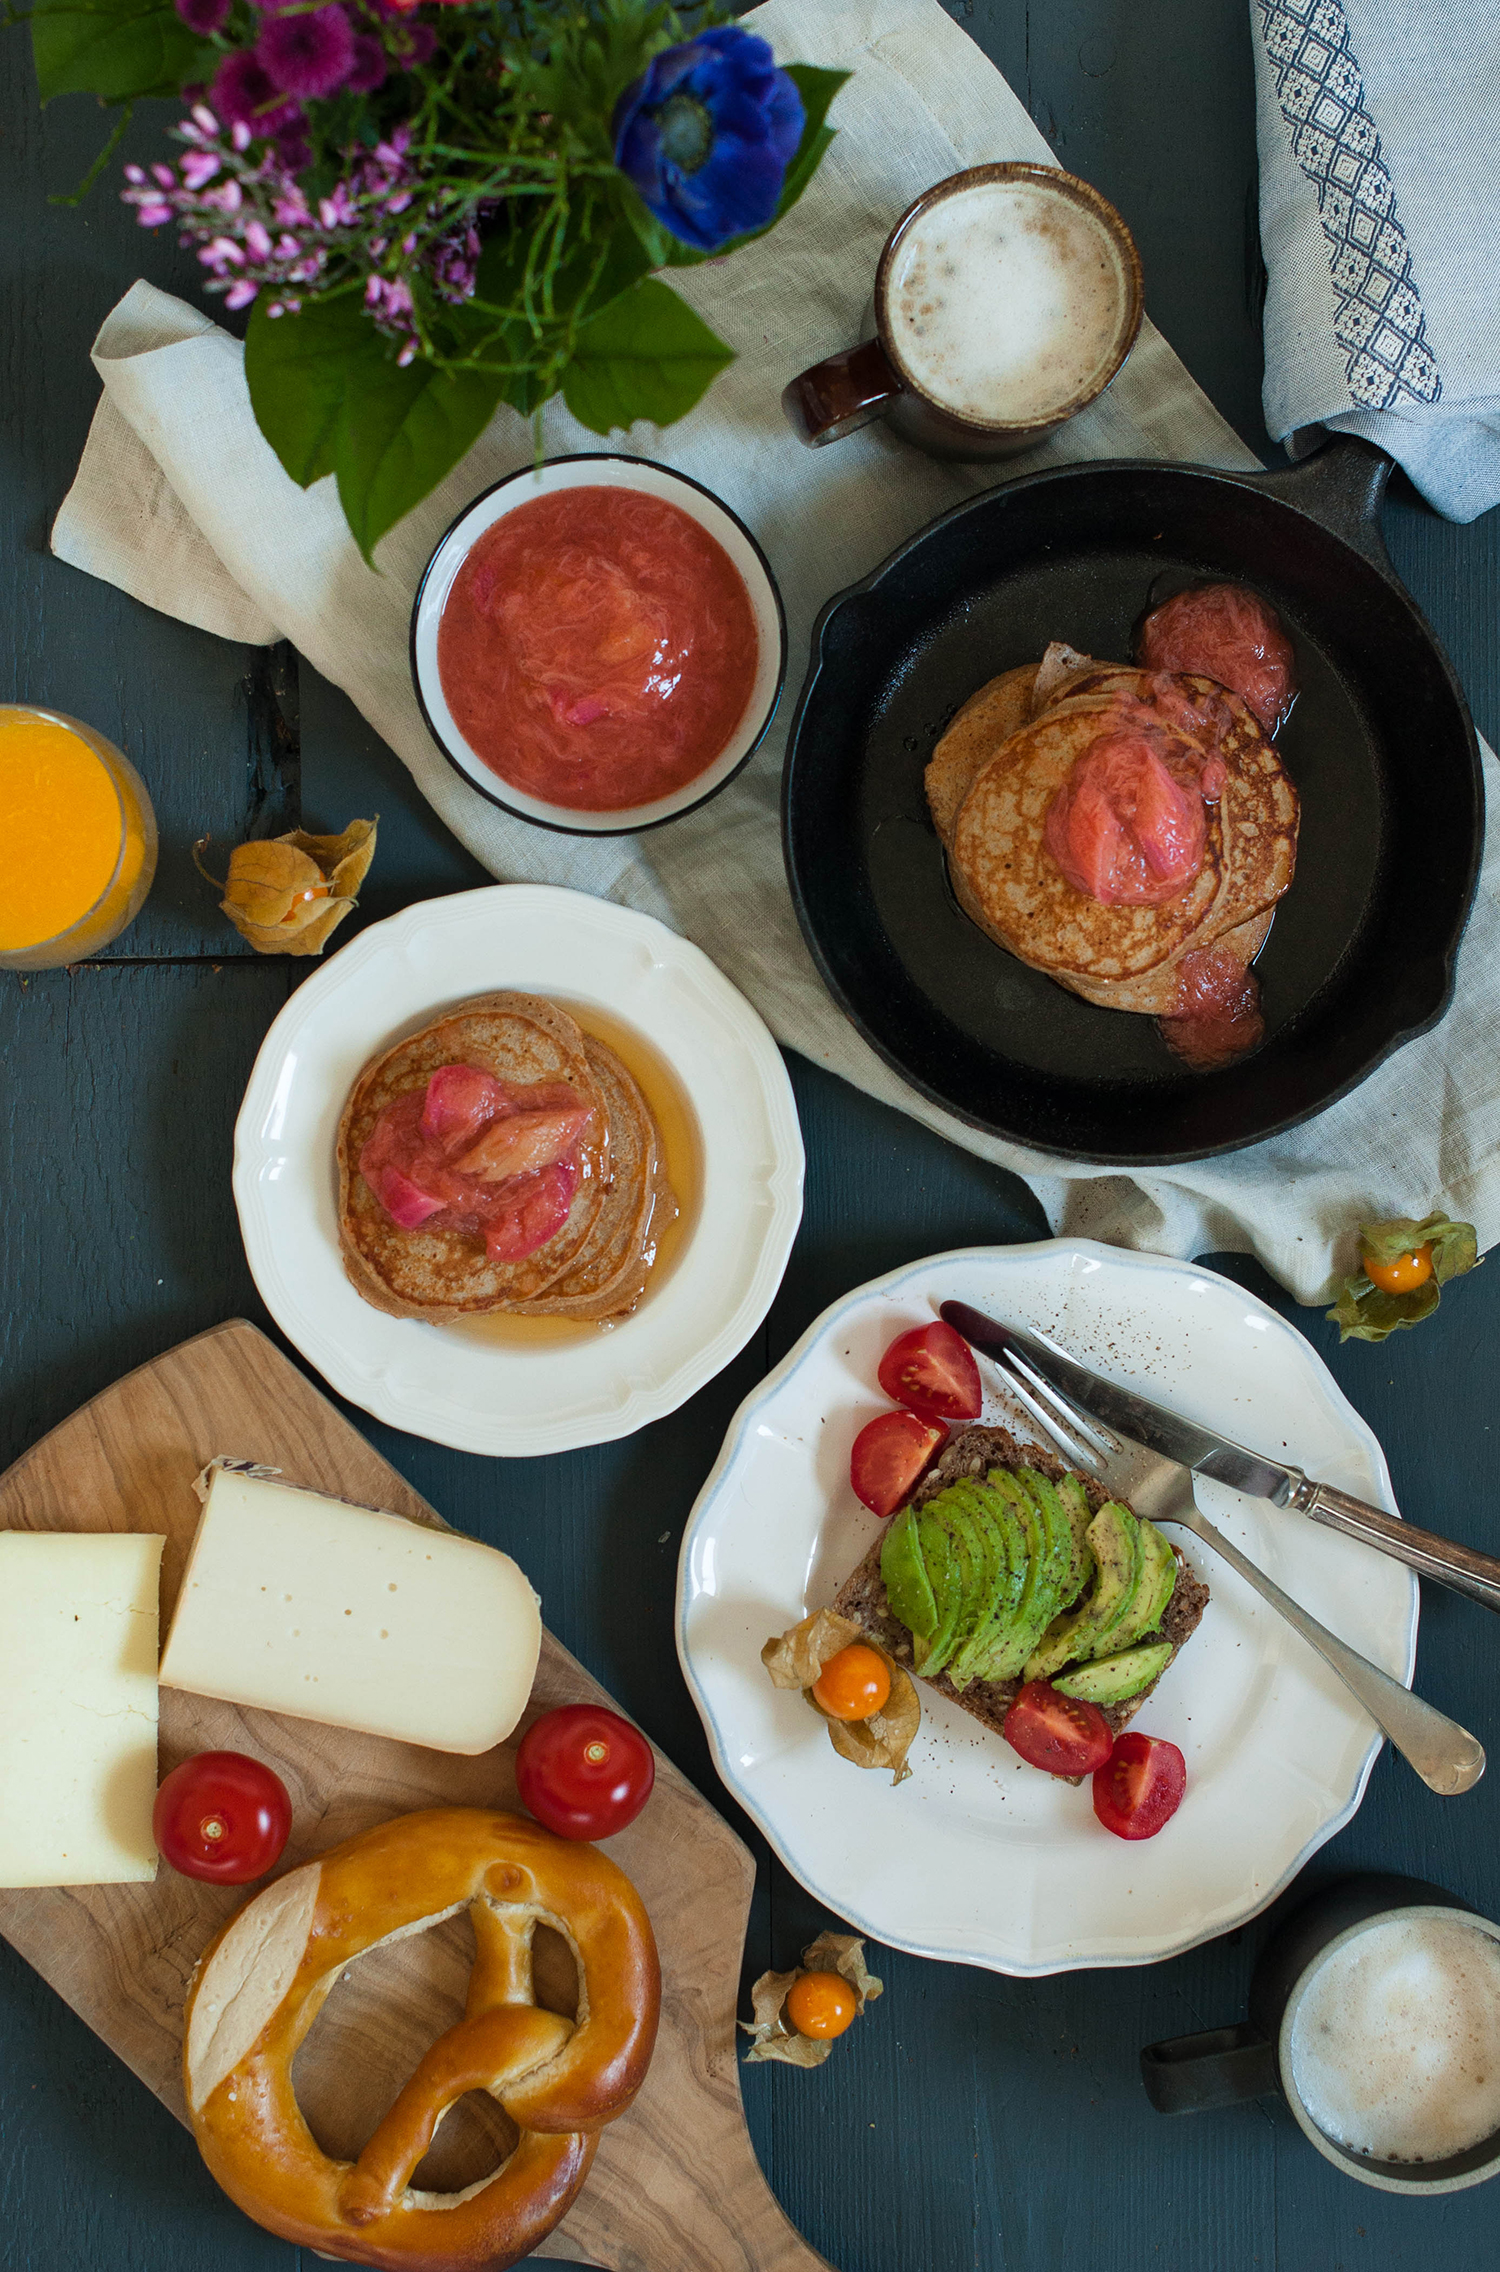 Rhubarb-orange-compote-pancakeslea-lou-3